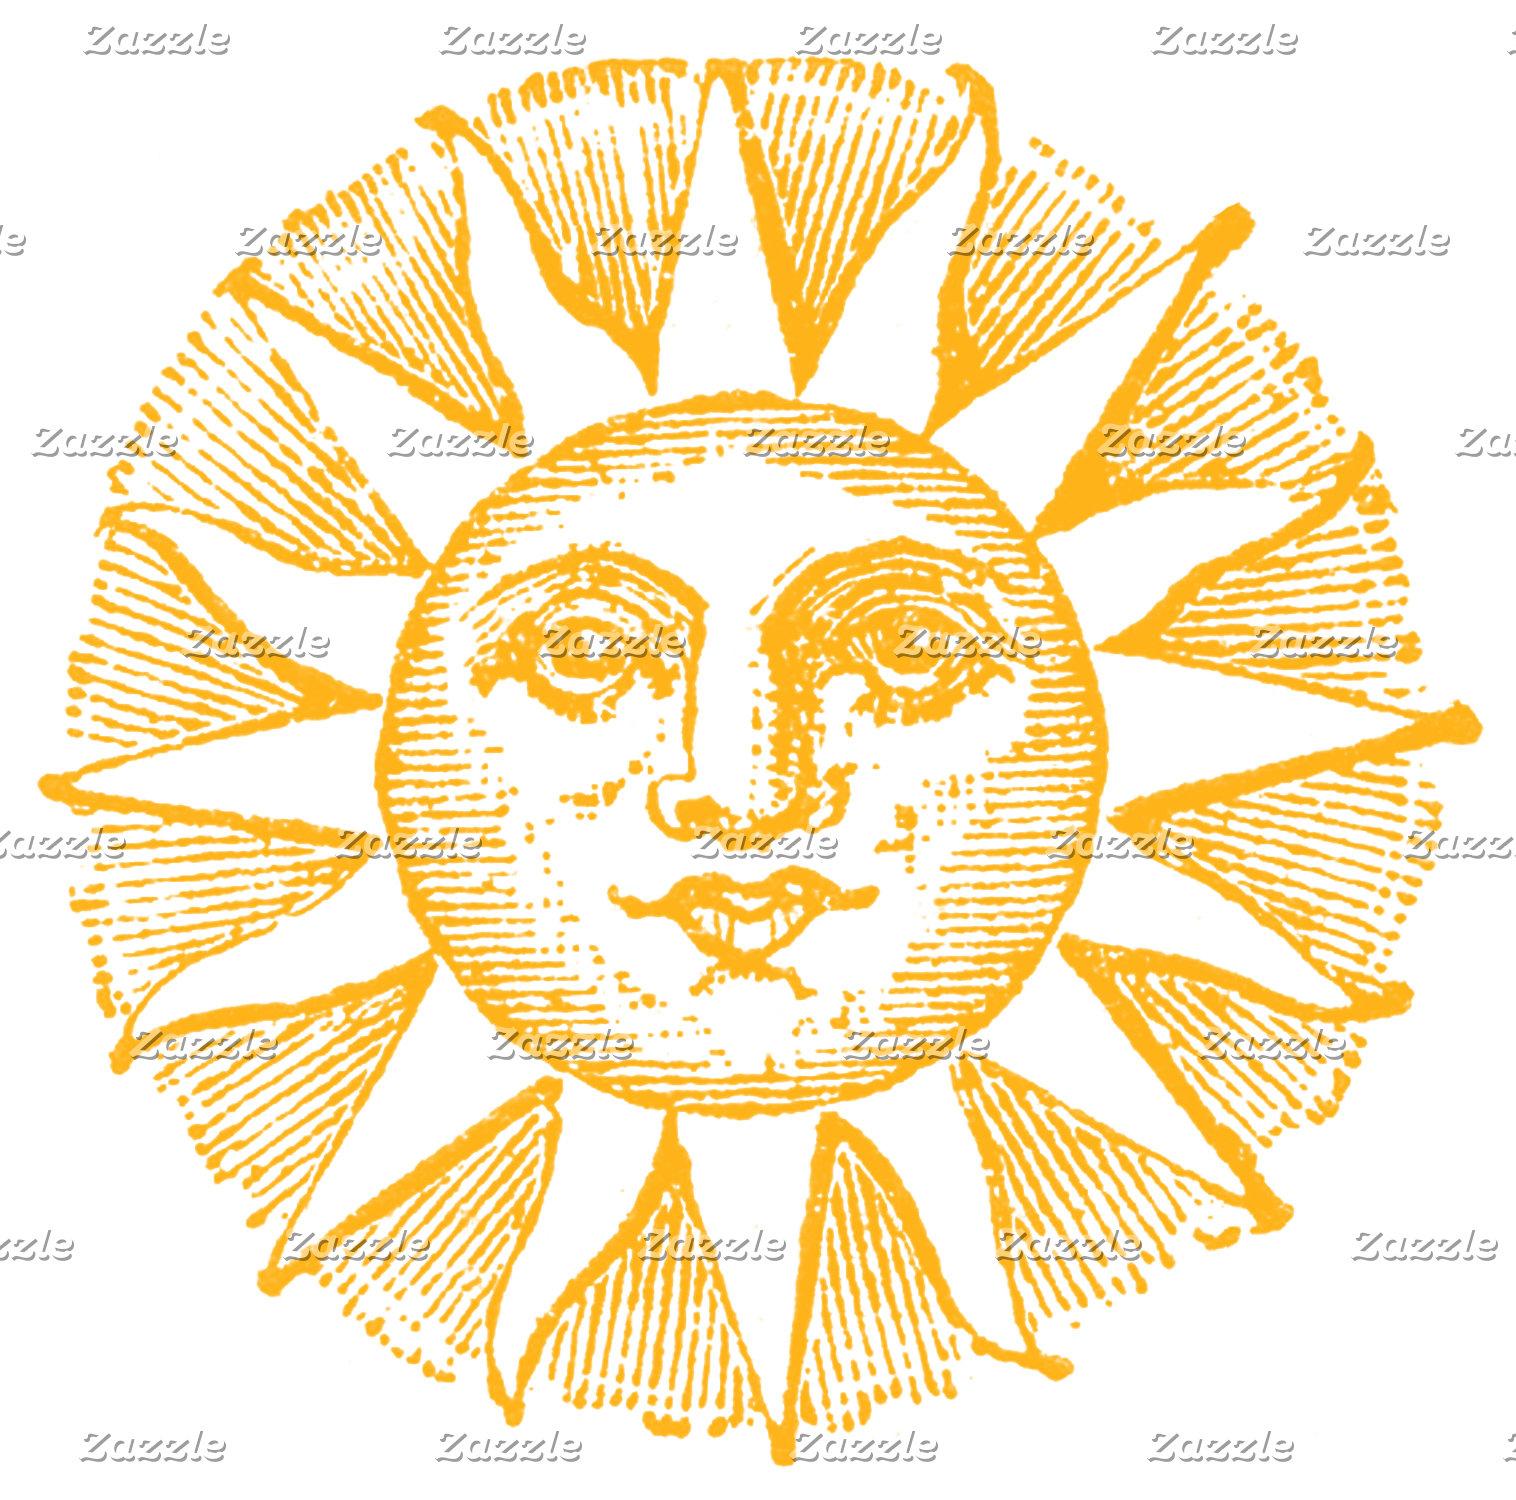 MOON SUN AND STARS